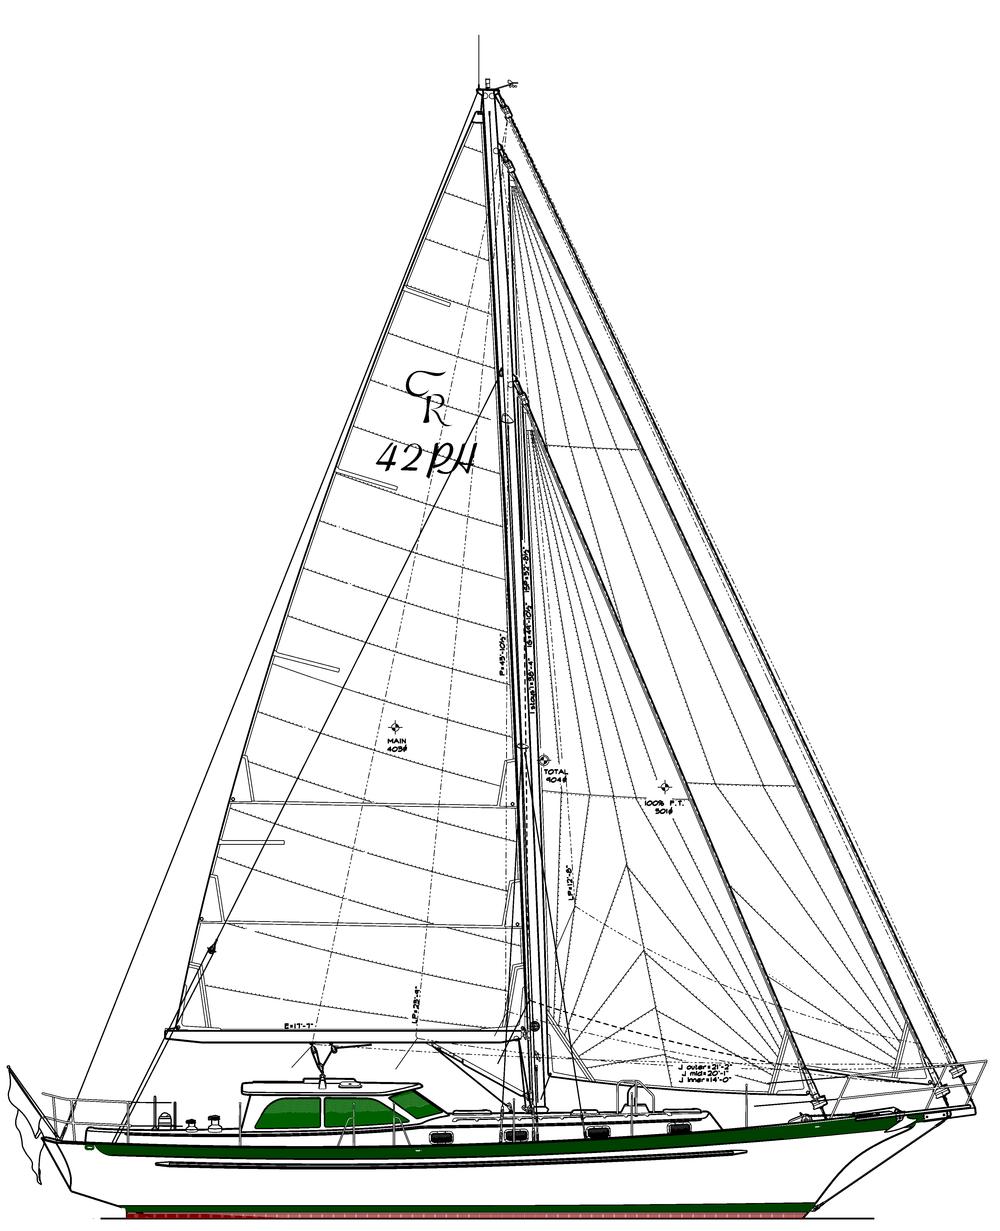 crph42_sail_plan.png